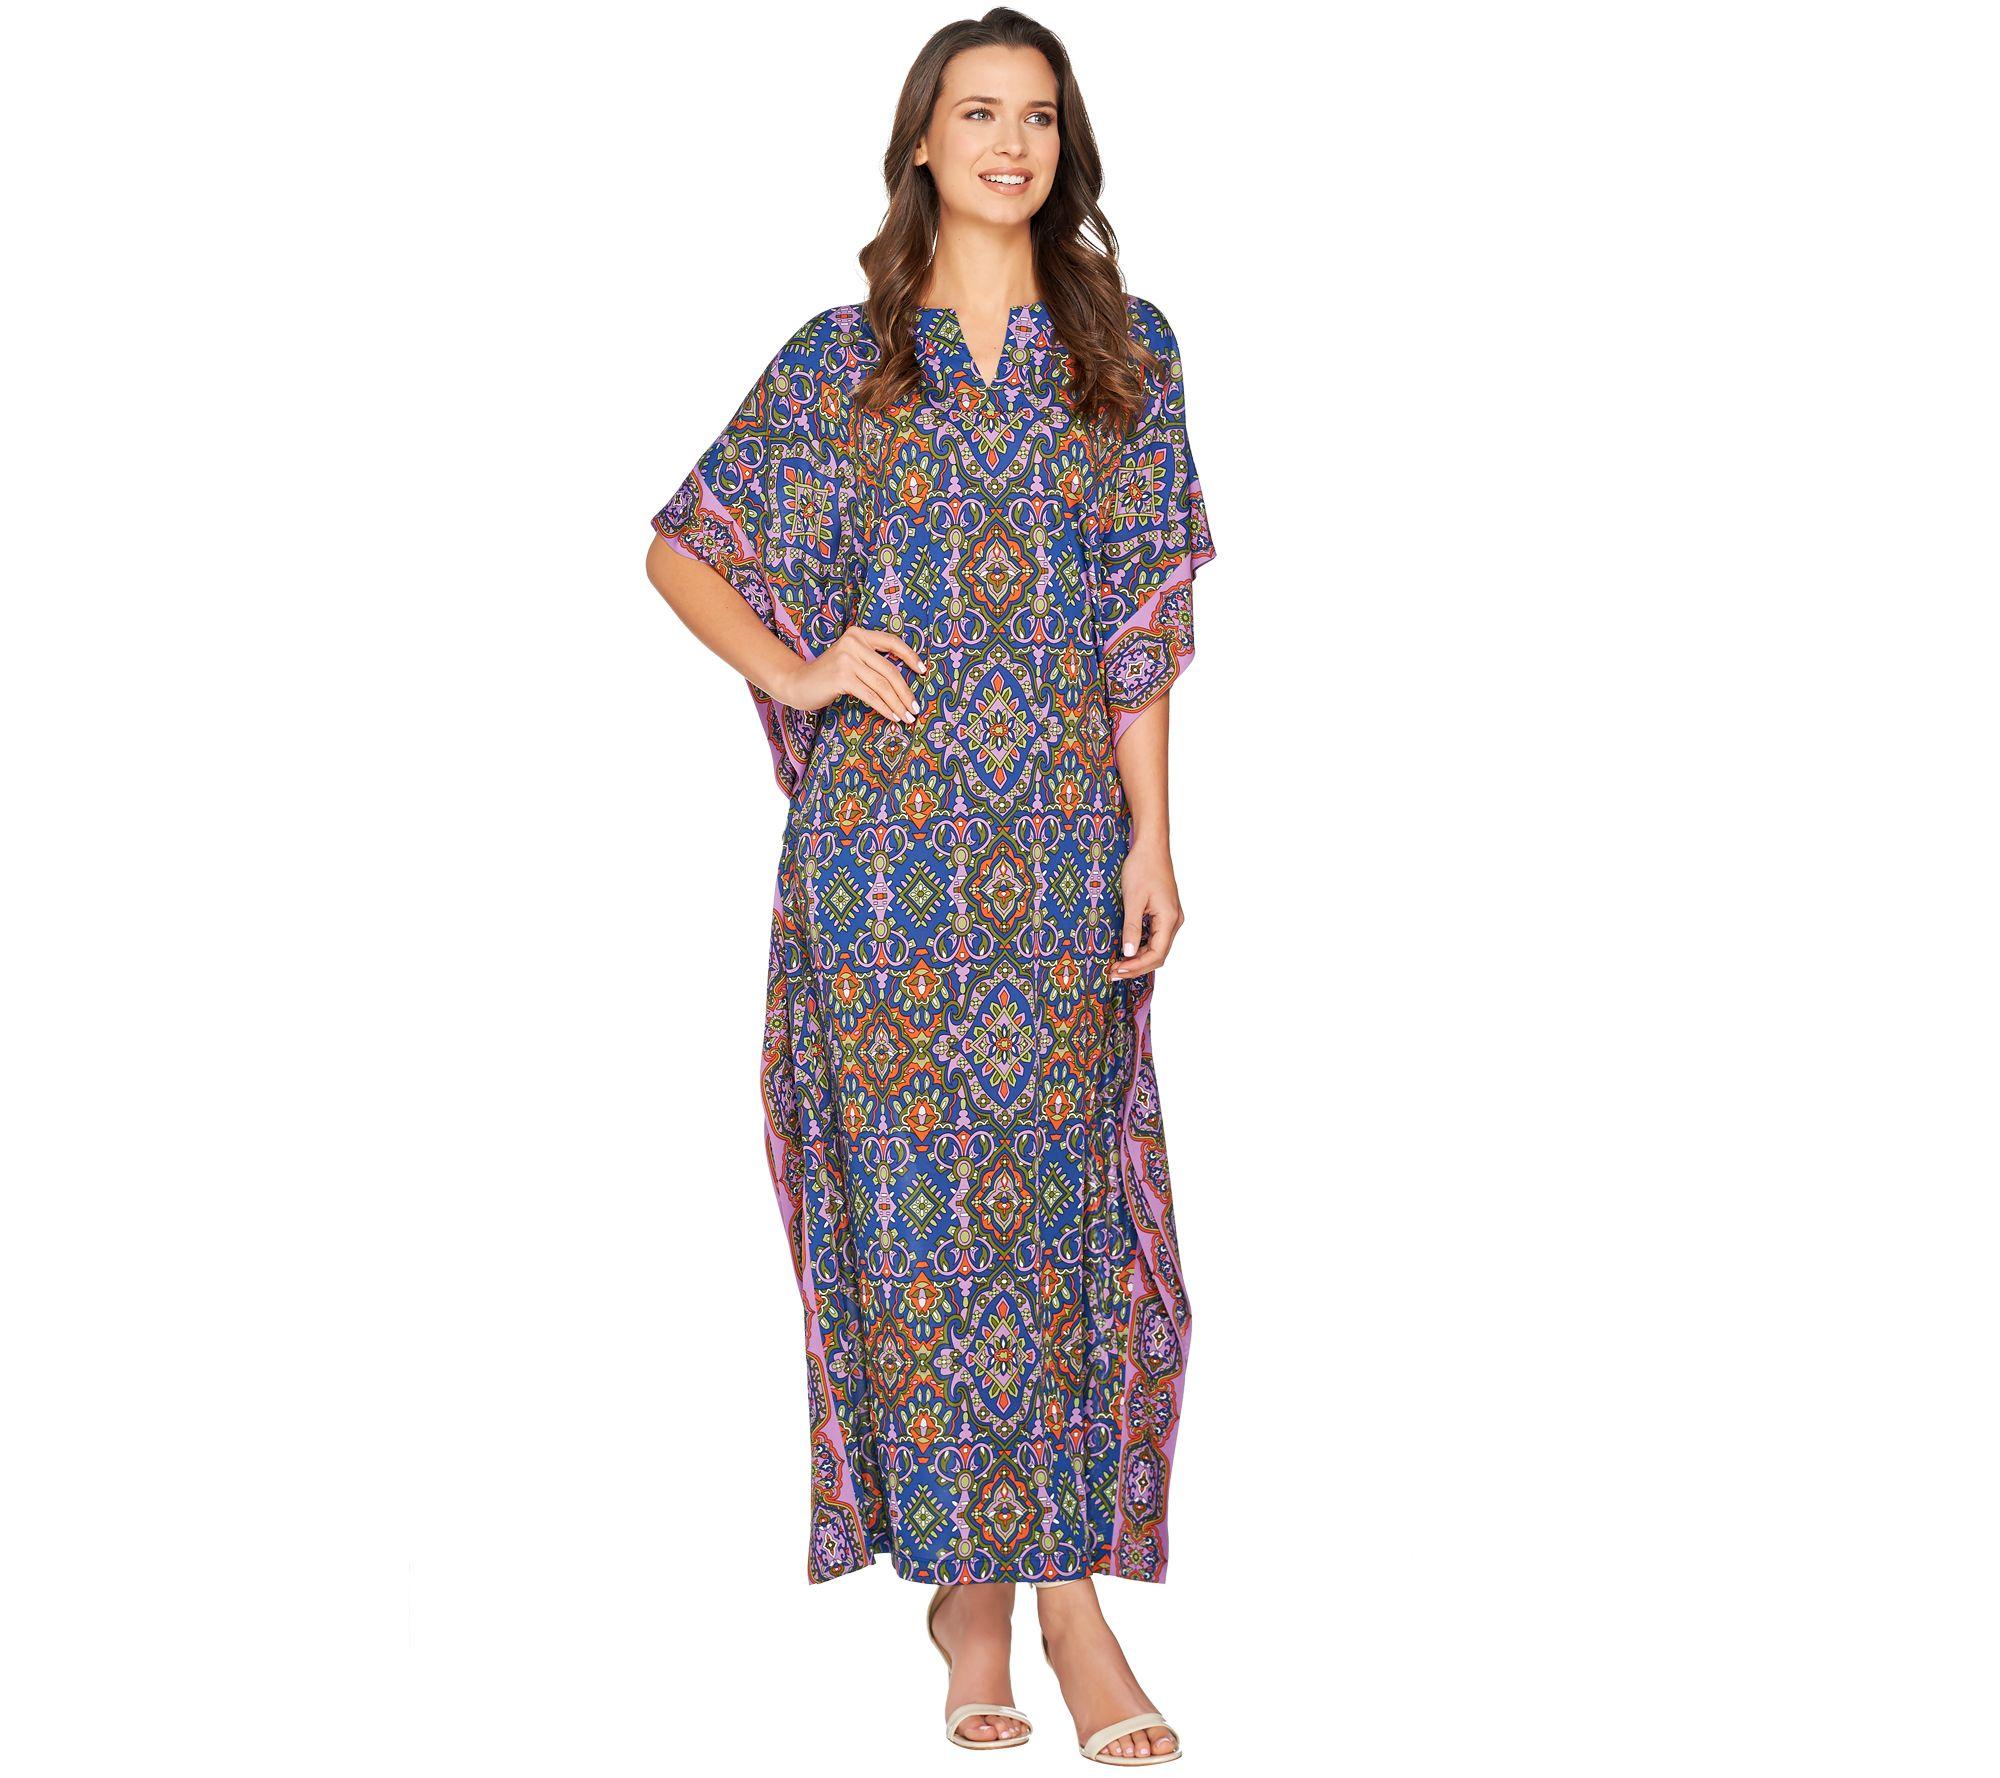 Joan Rivers Spice Market Jersey Knit Caftan — QVC.com